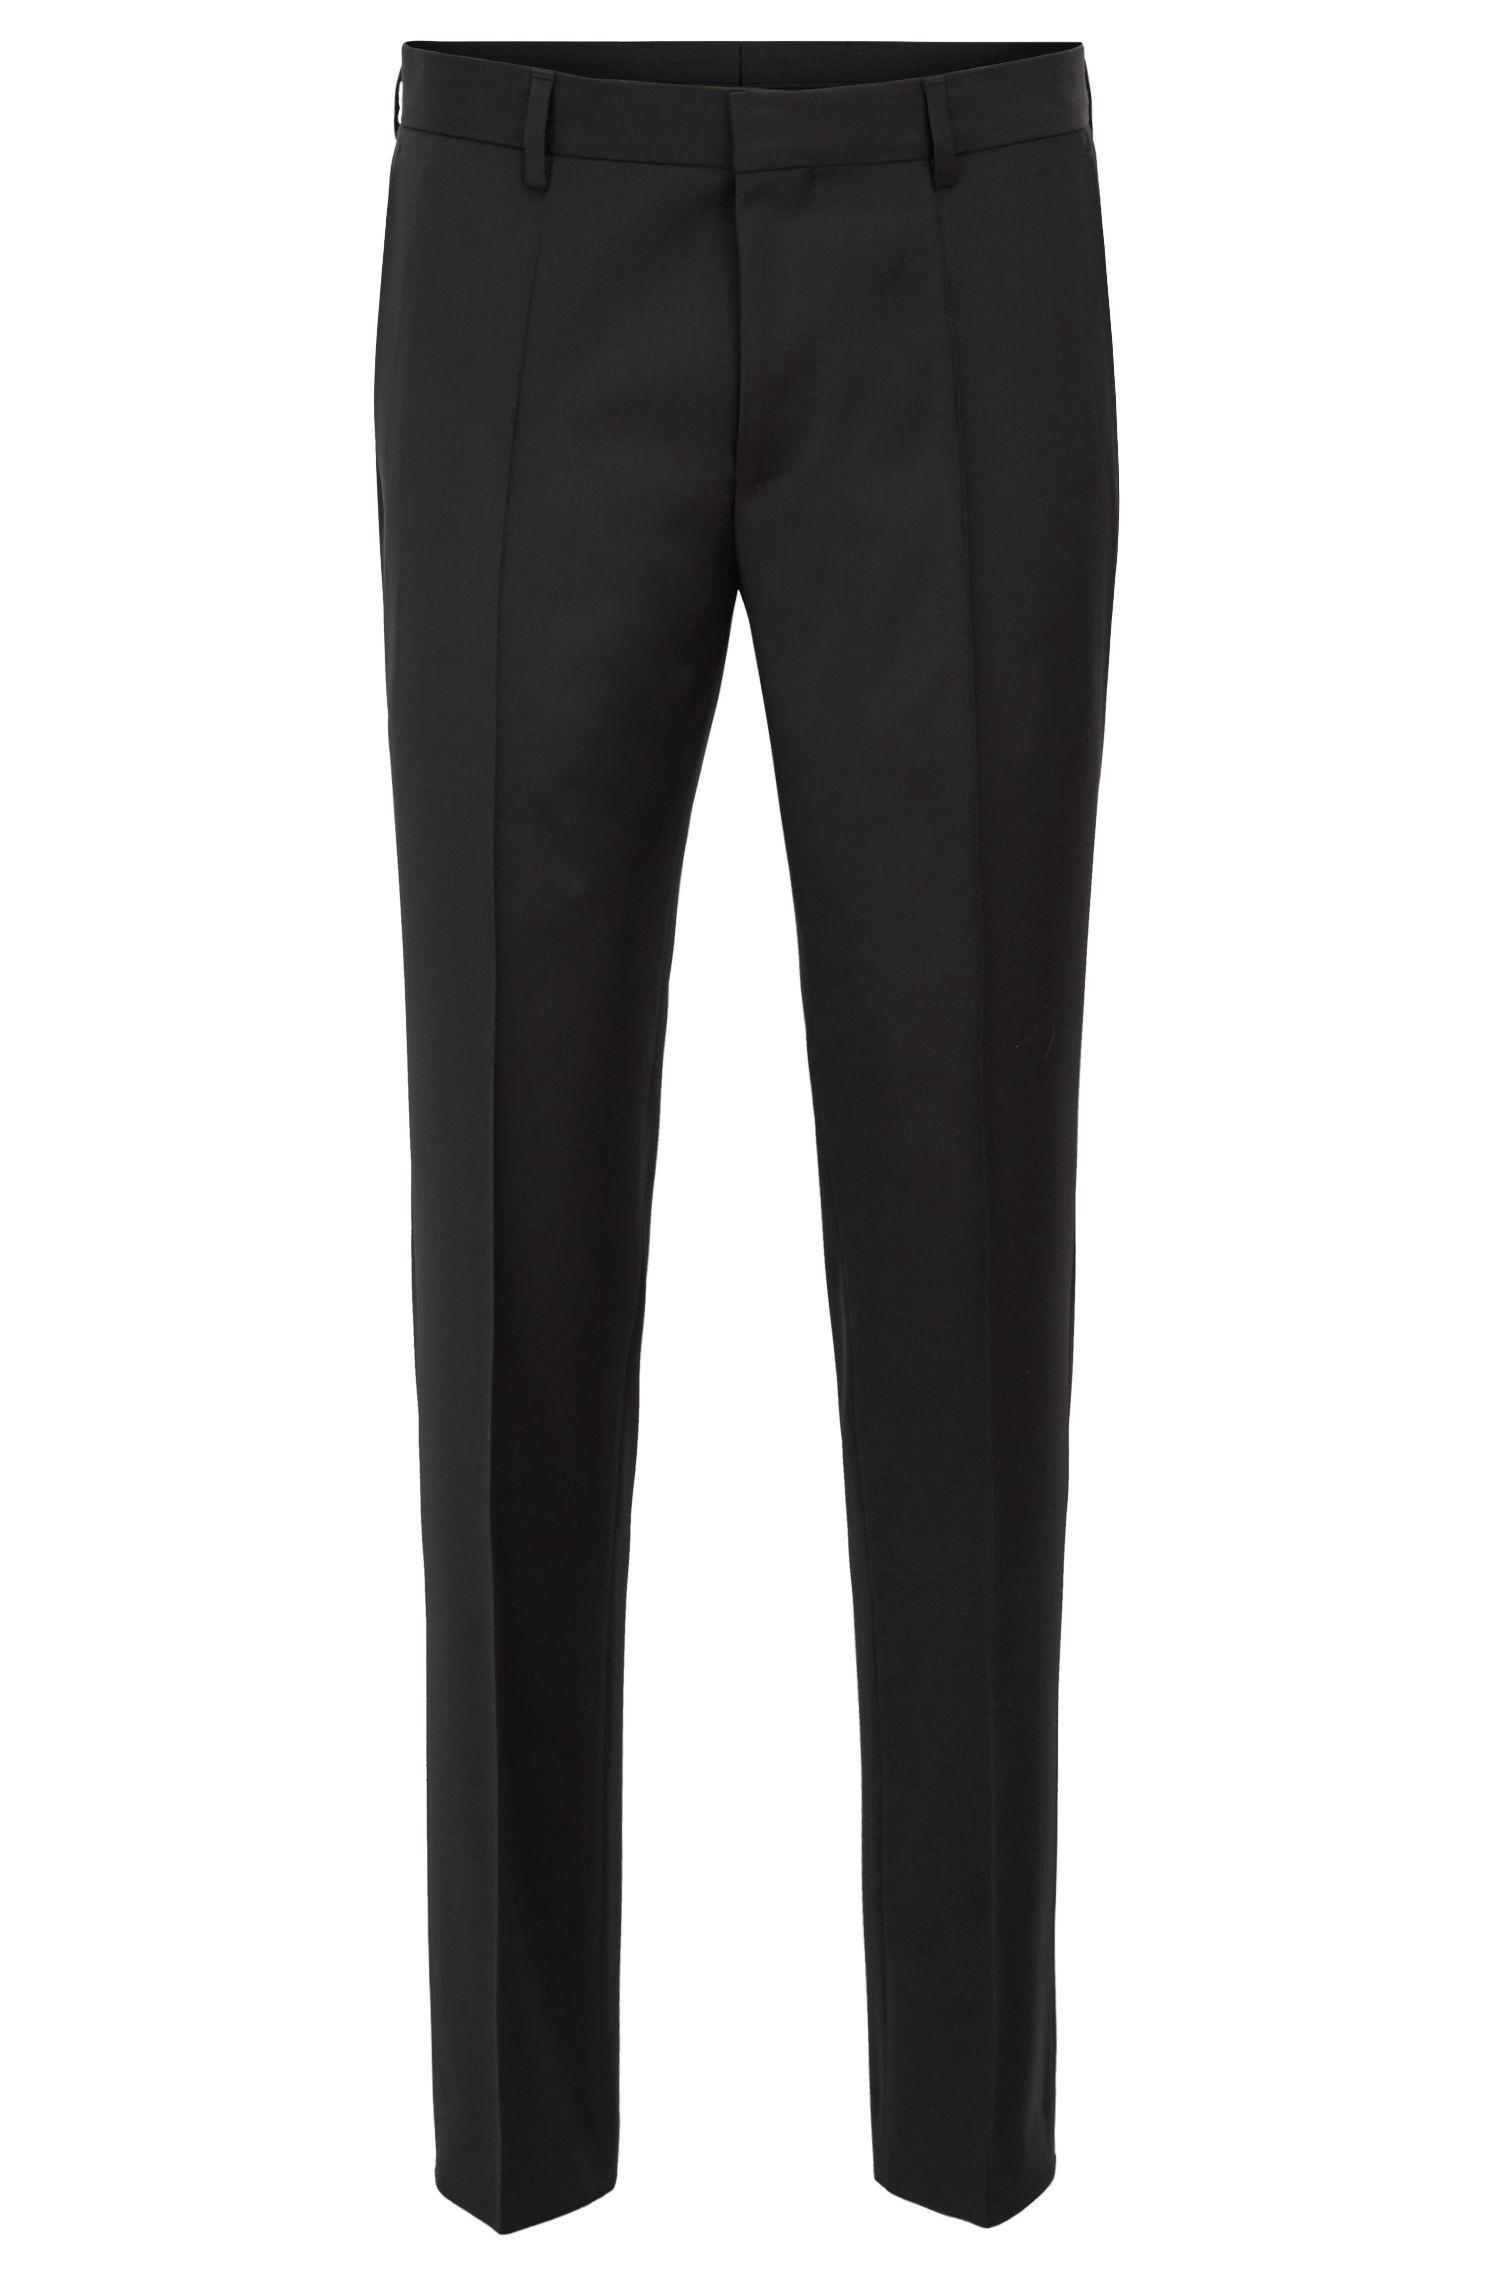 Virgin Wool Dress Pants, Slim Fit   Gibson CYL